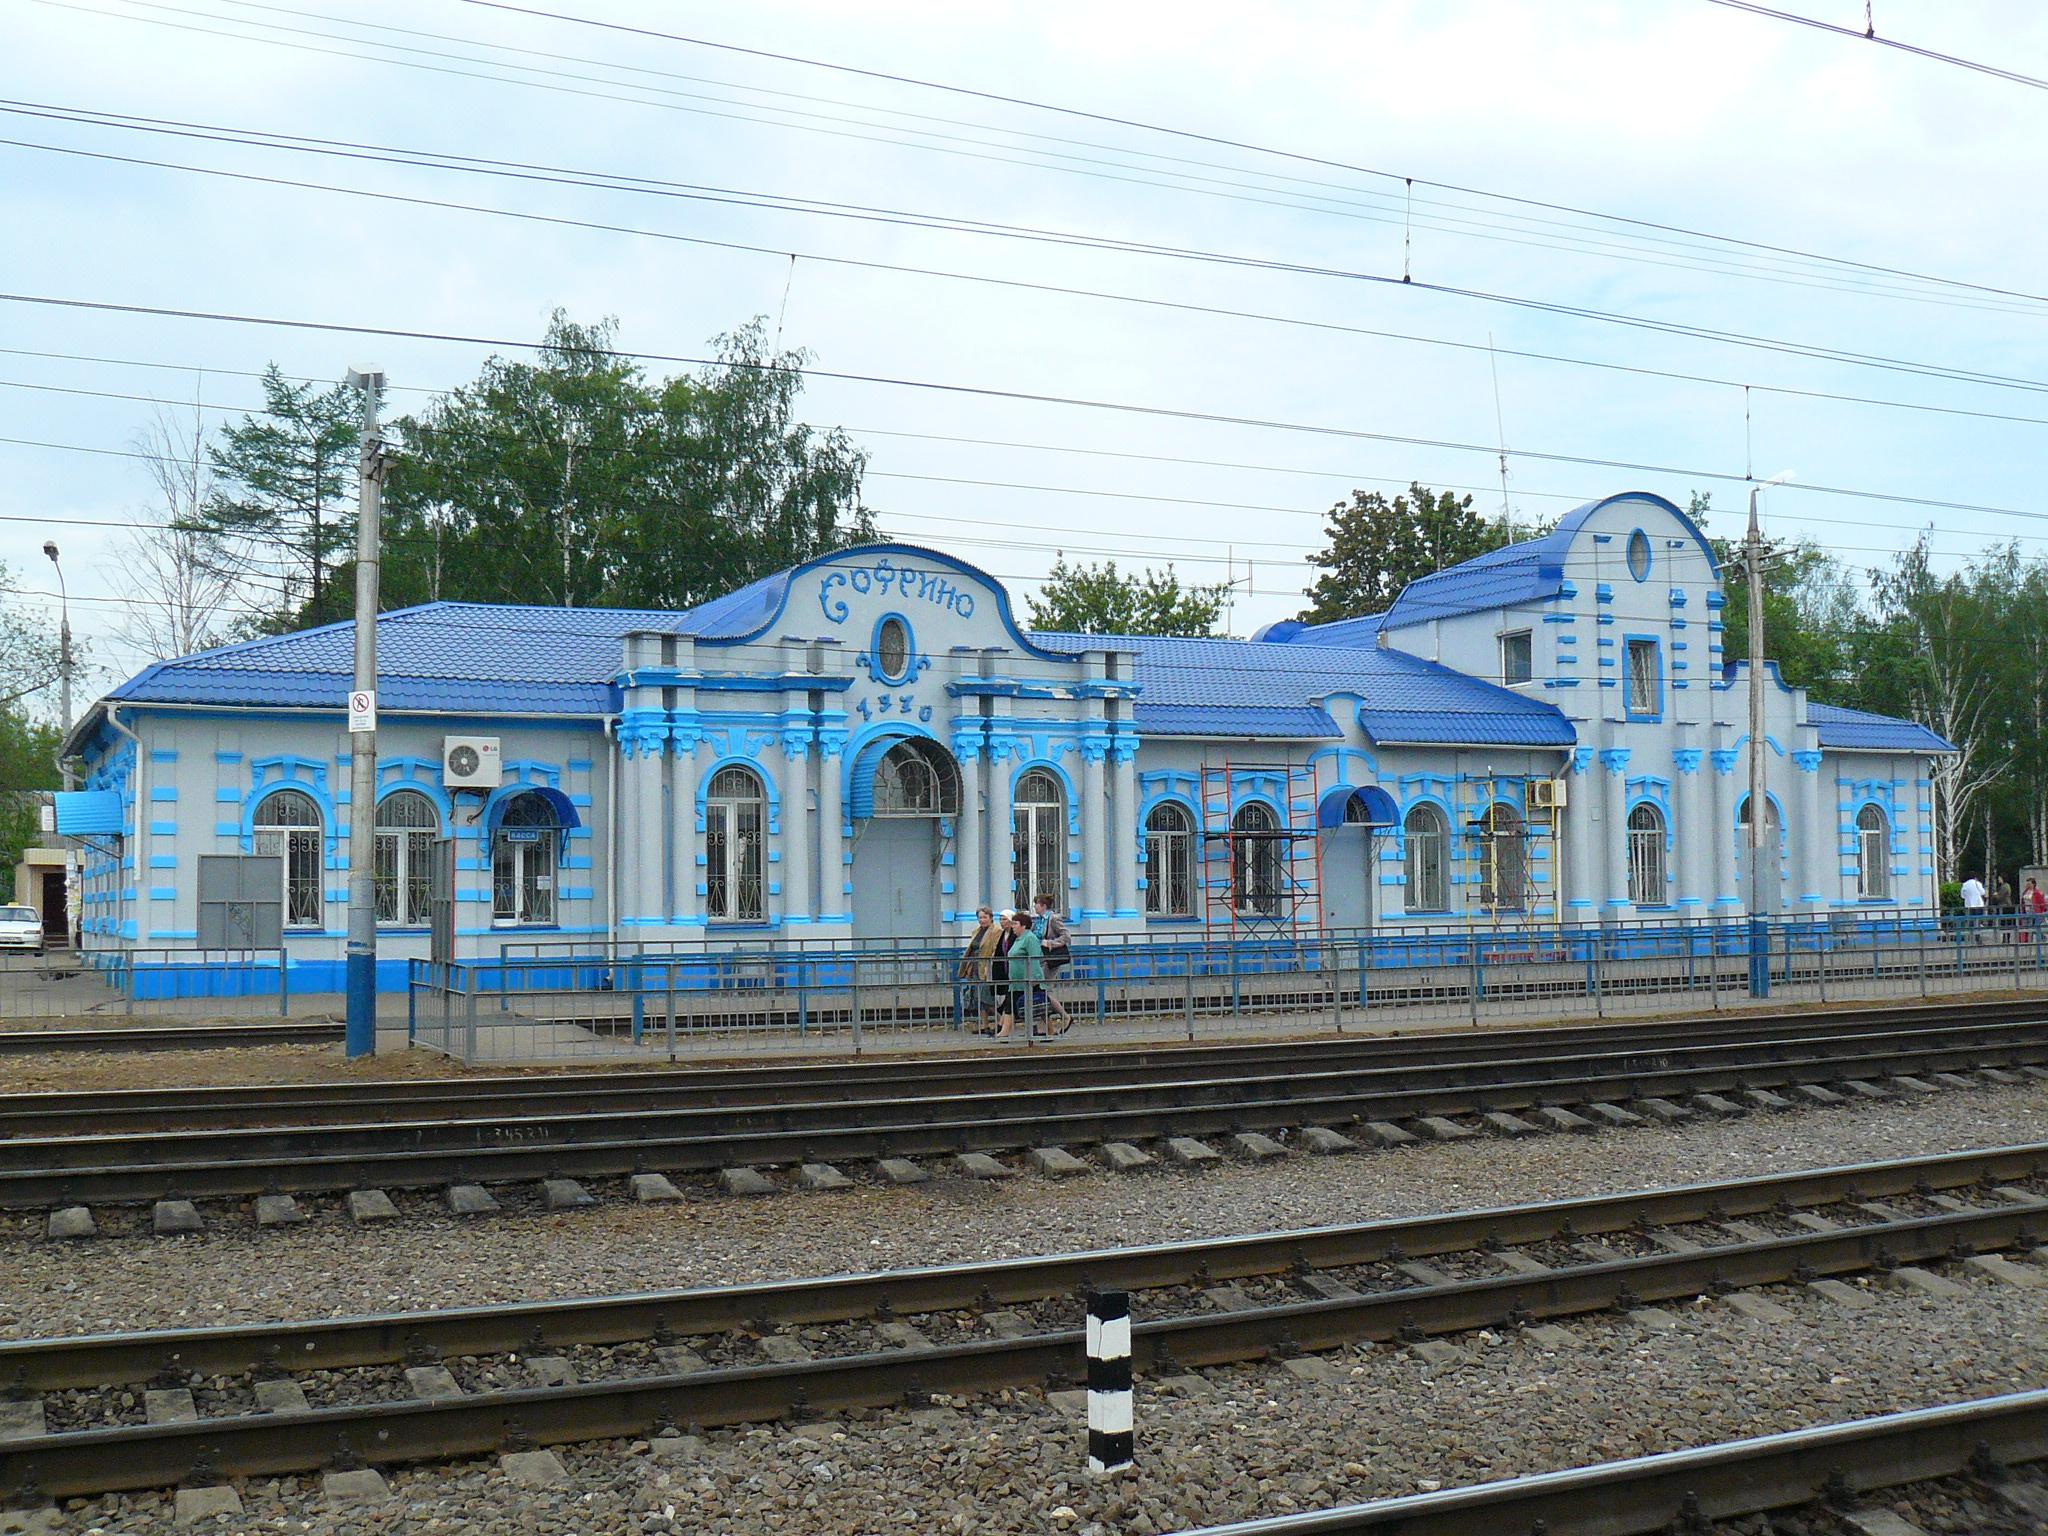 http://pics.livejournal.com/pushkino_2009/pic/000w6w1d